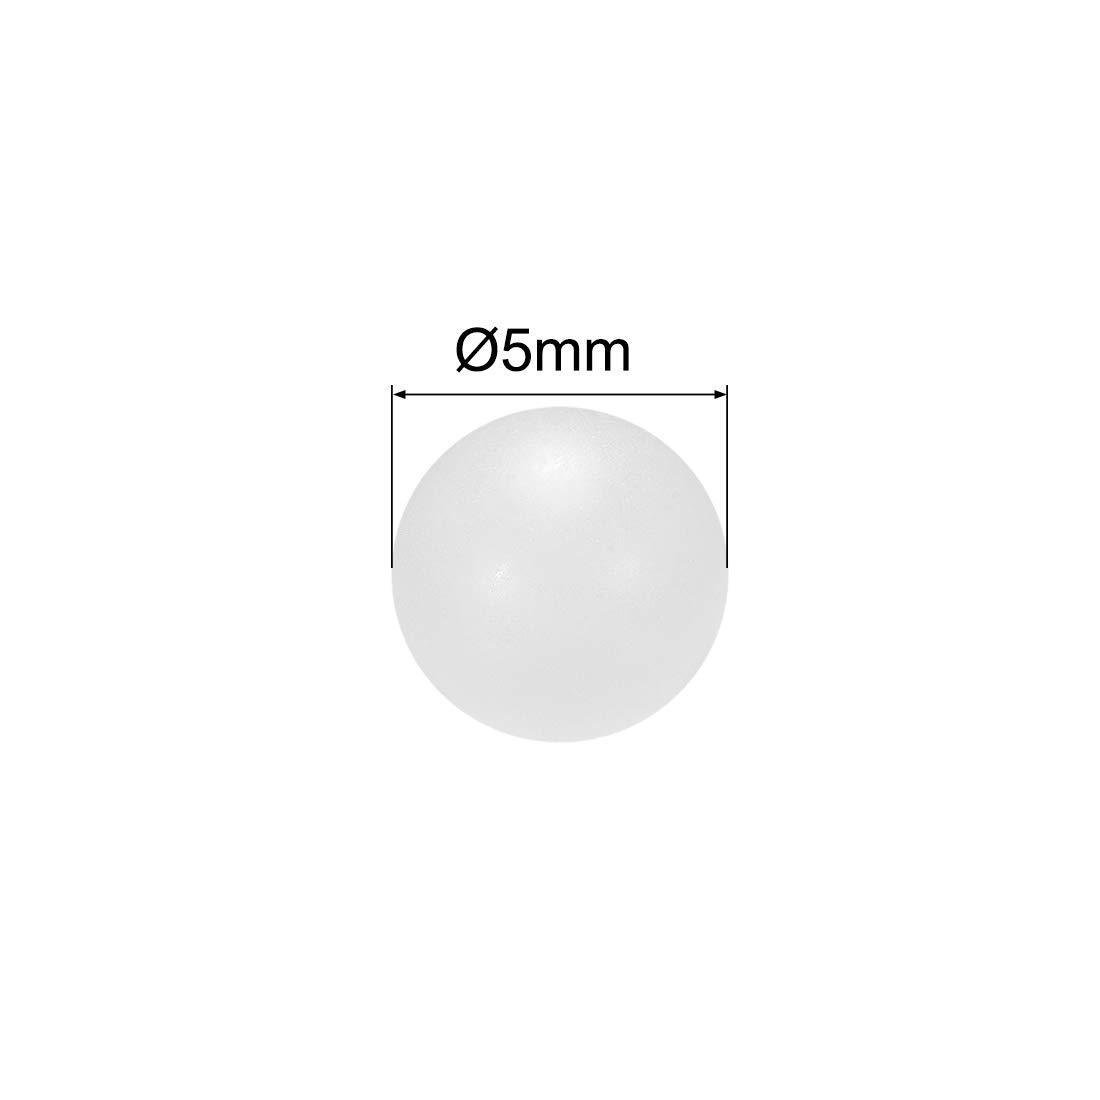 Precision Bearing Ball 100pcs uxcell 3mm PP Solid Plastic Balls